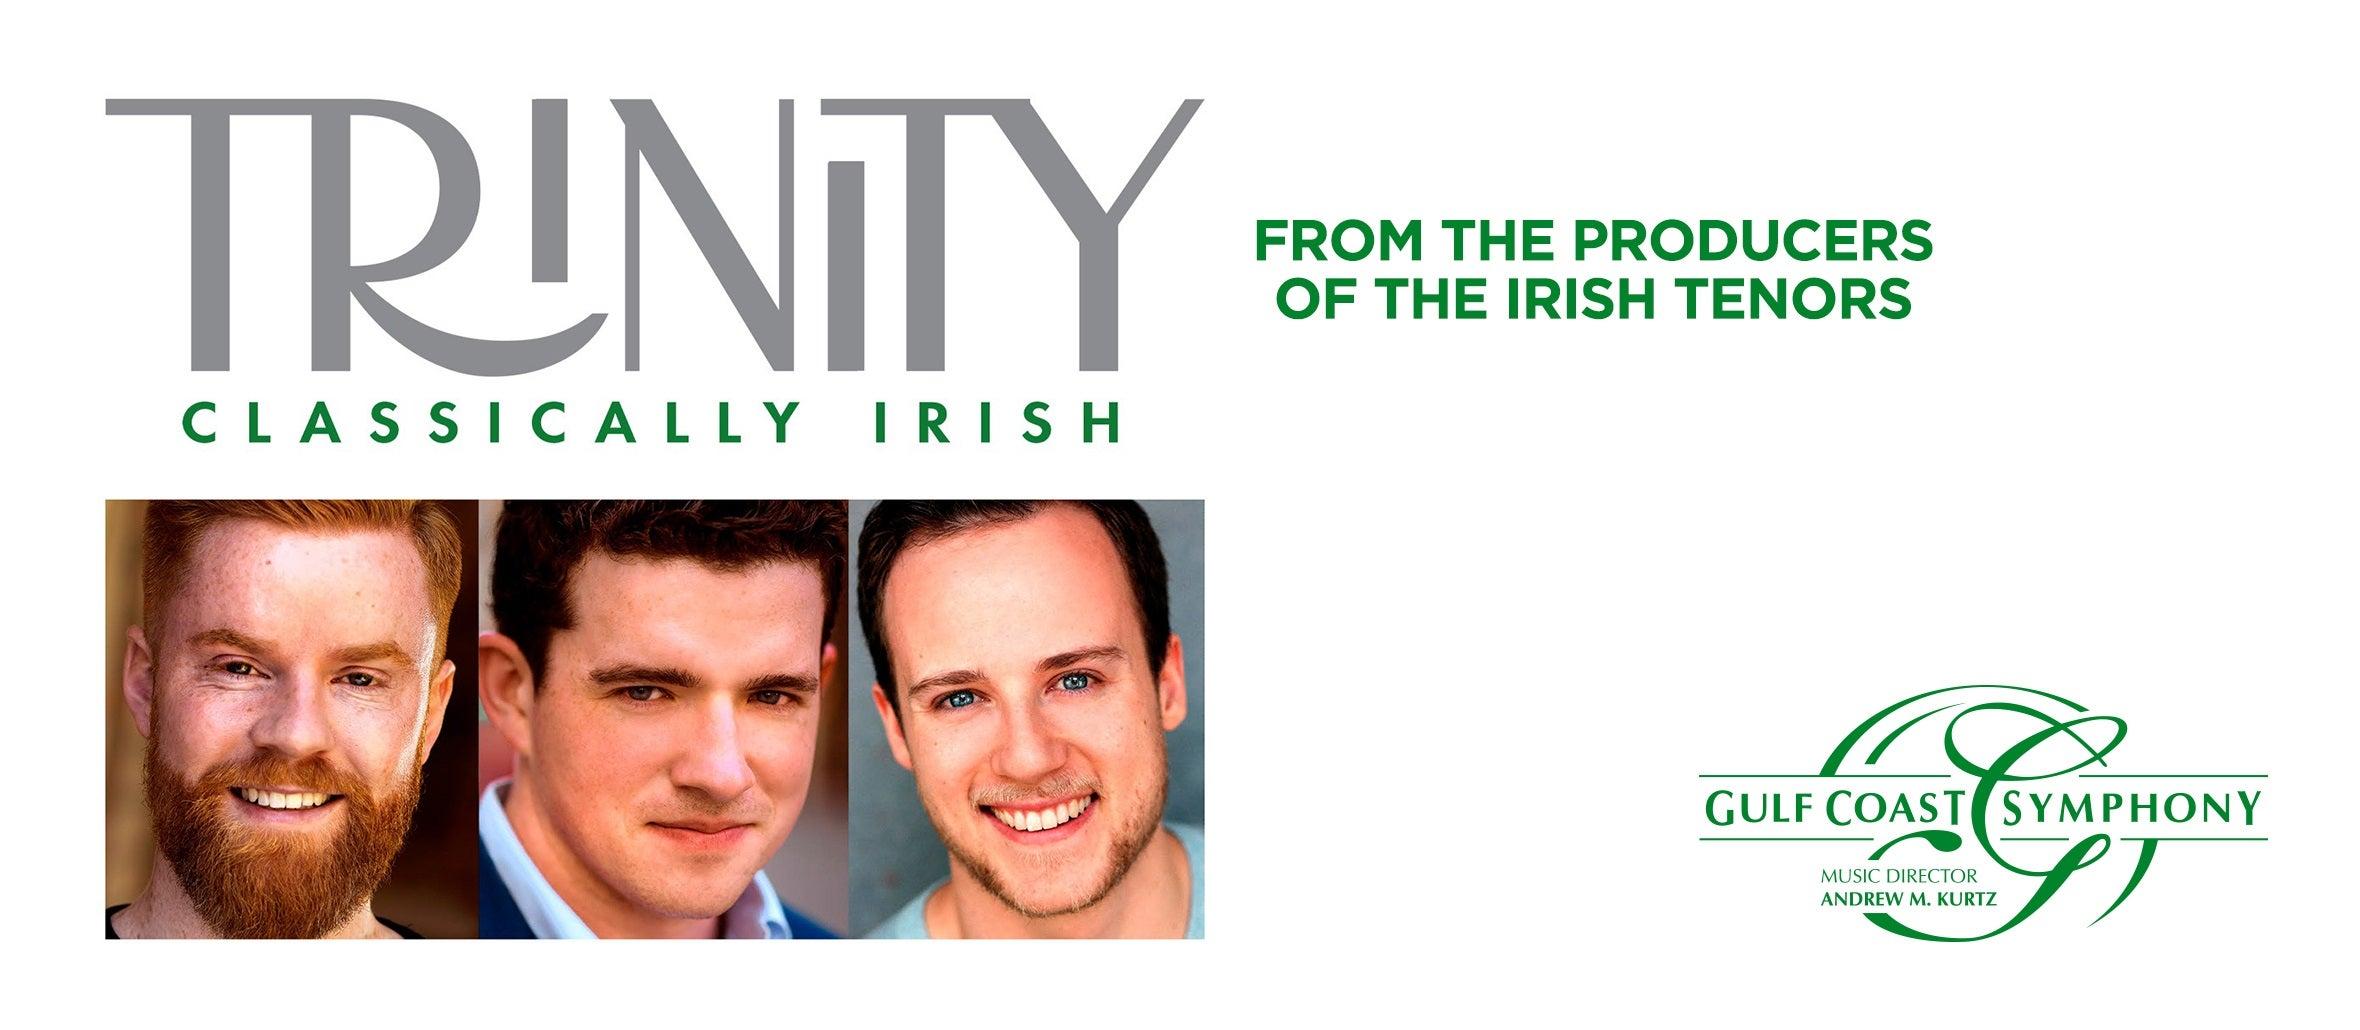 TRINITY: Classically Irish